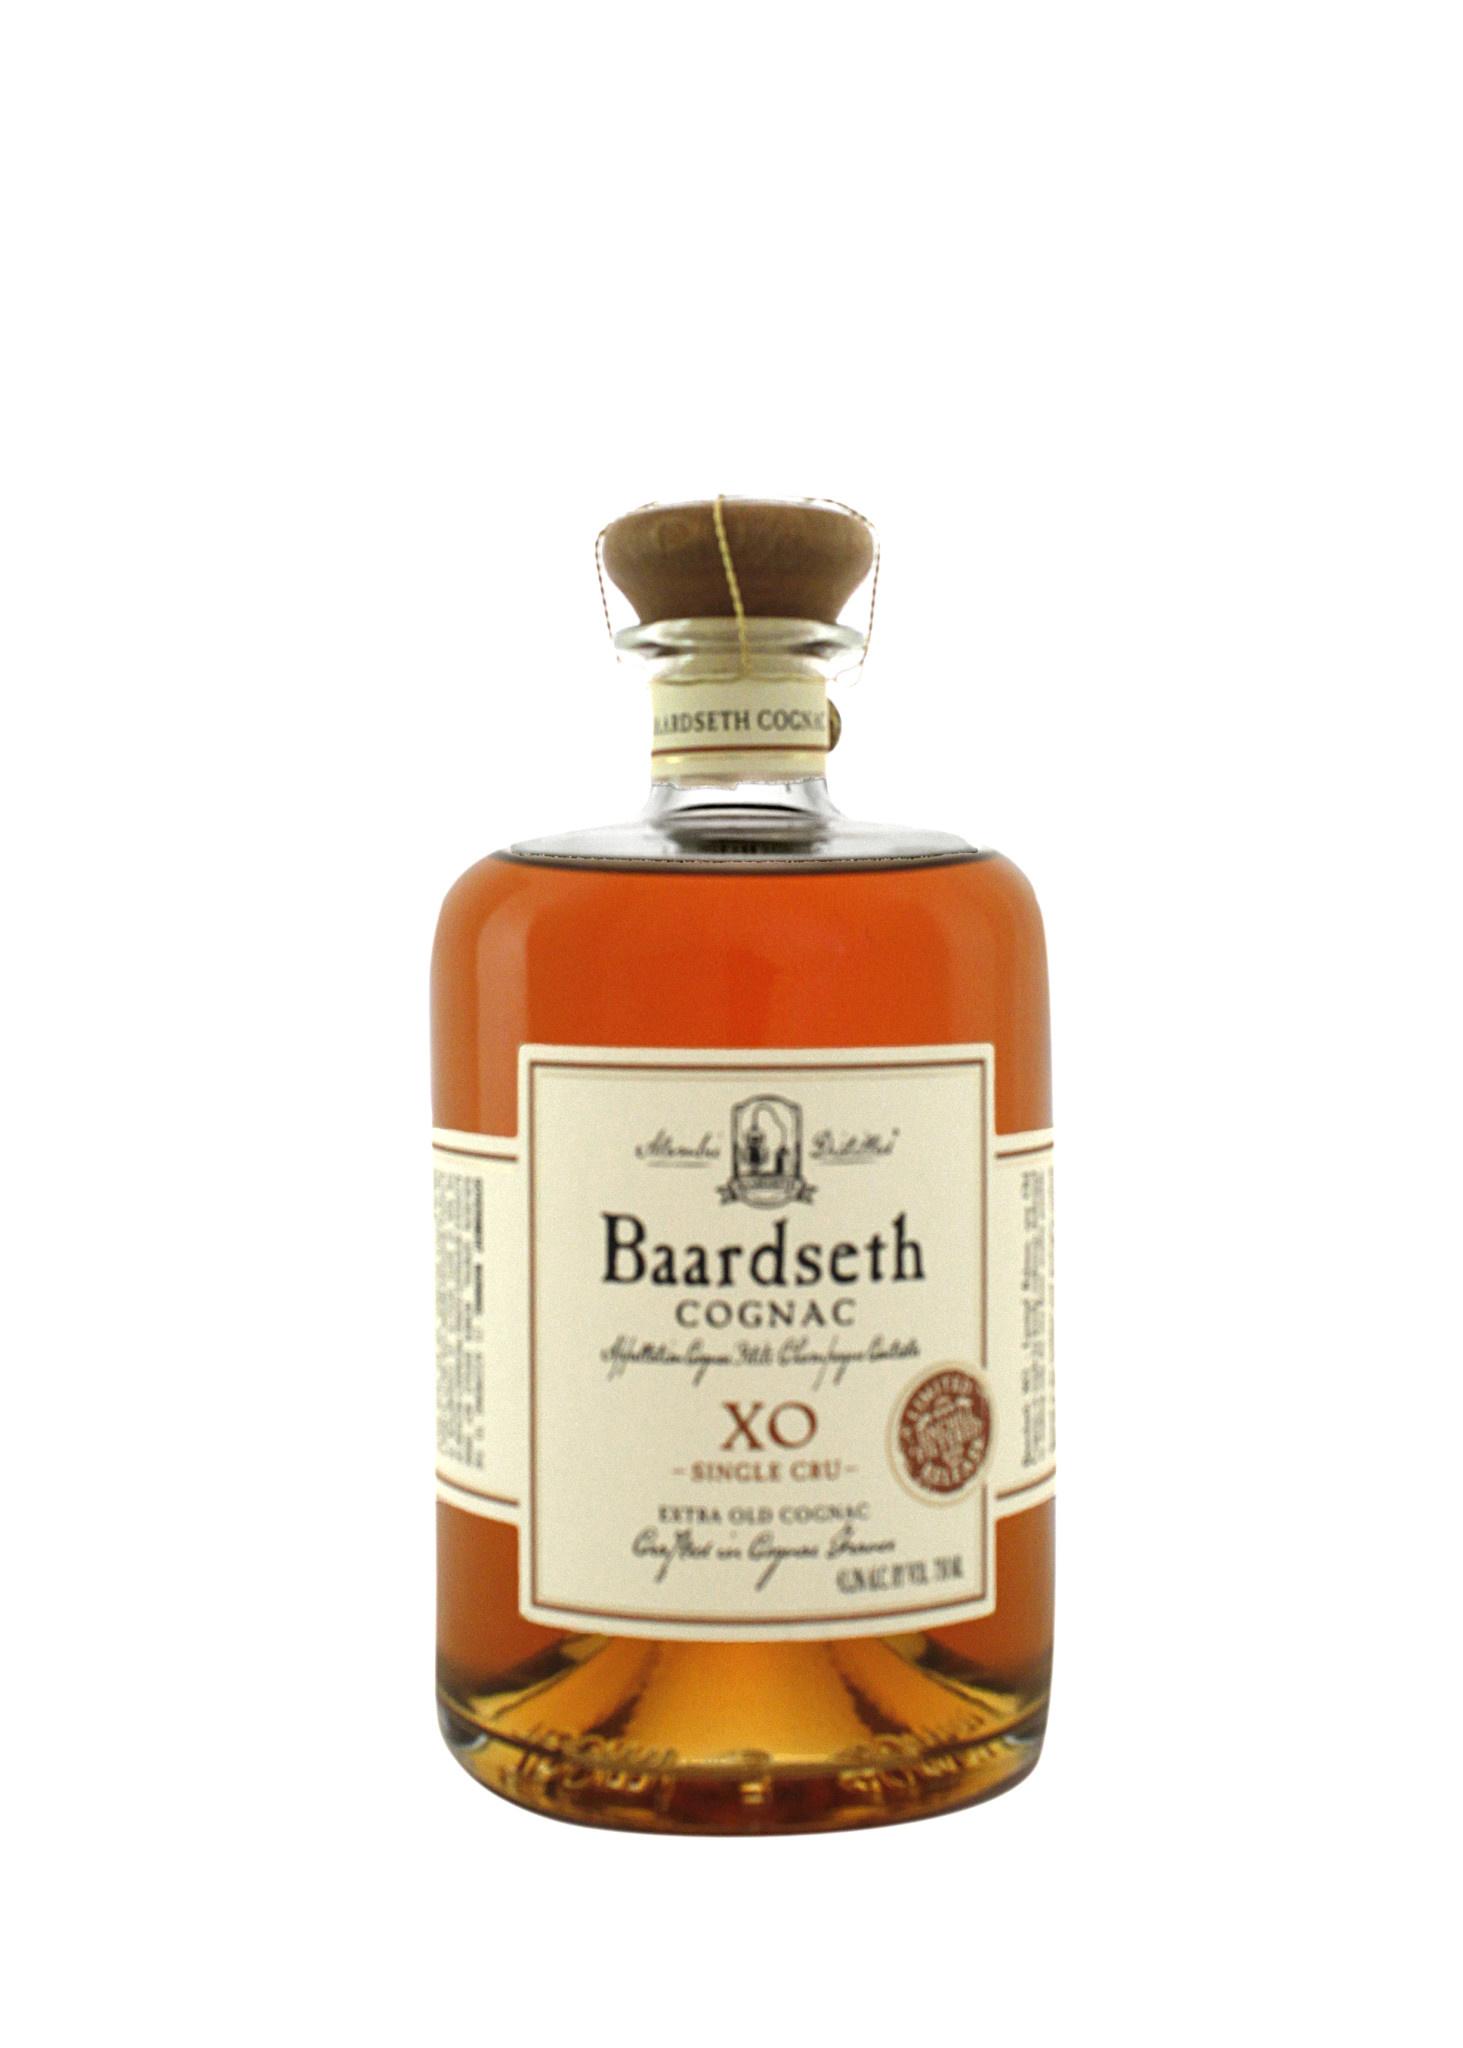 Baardseth Cognac XO Single Cru